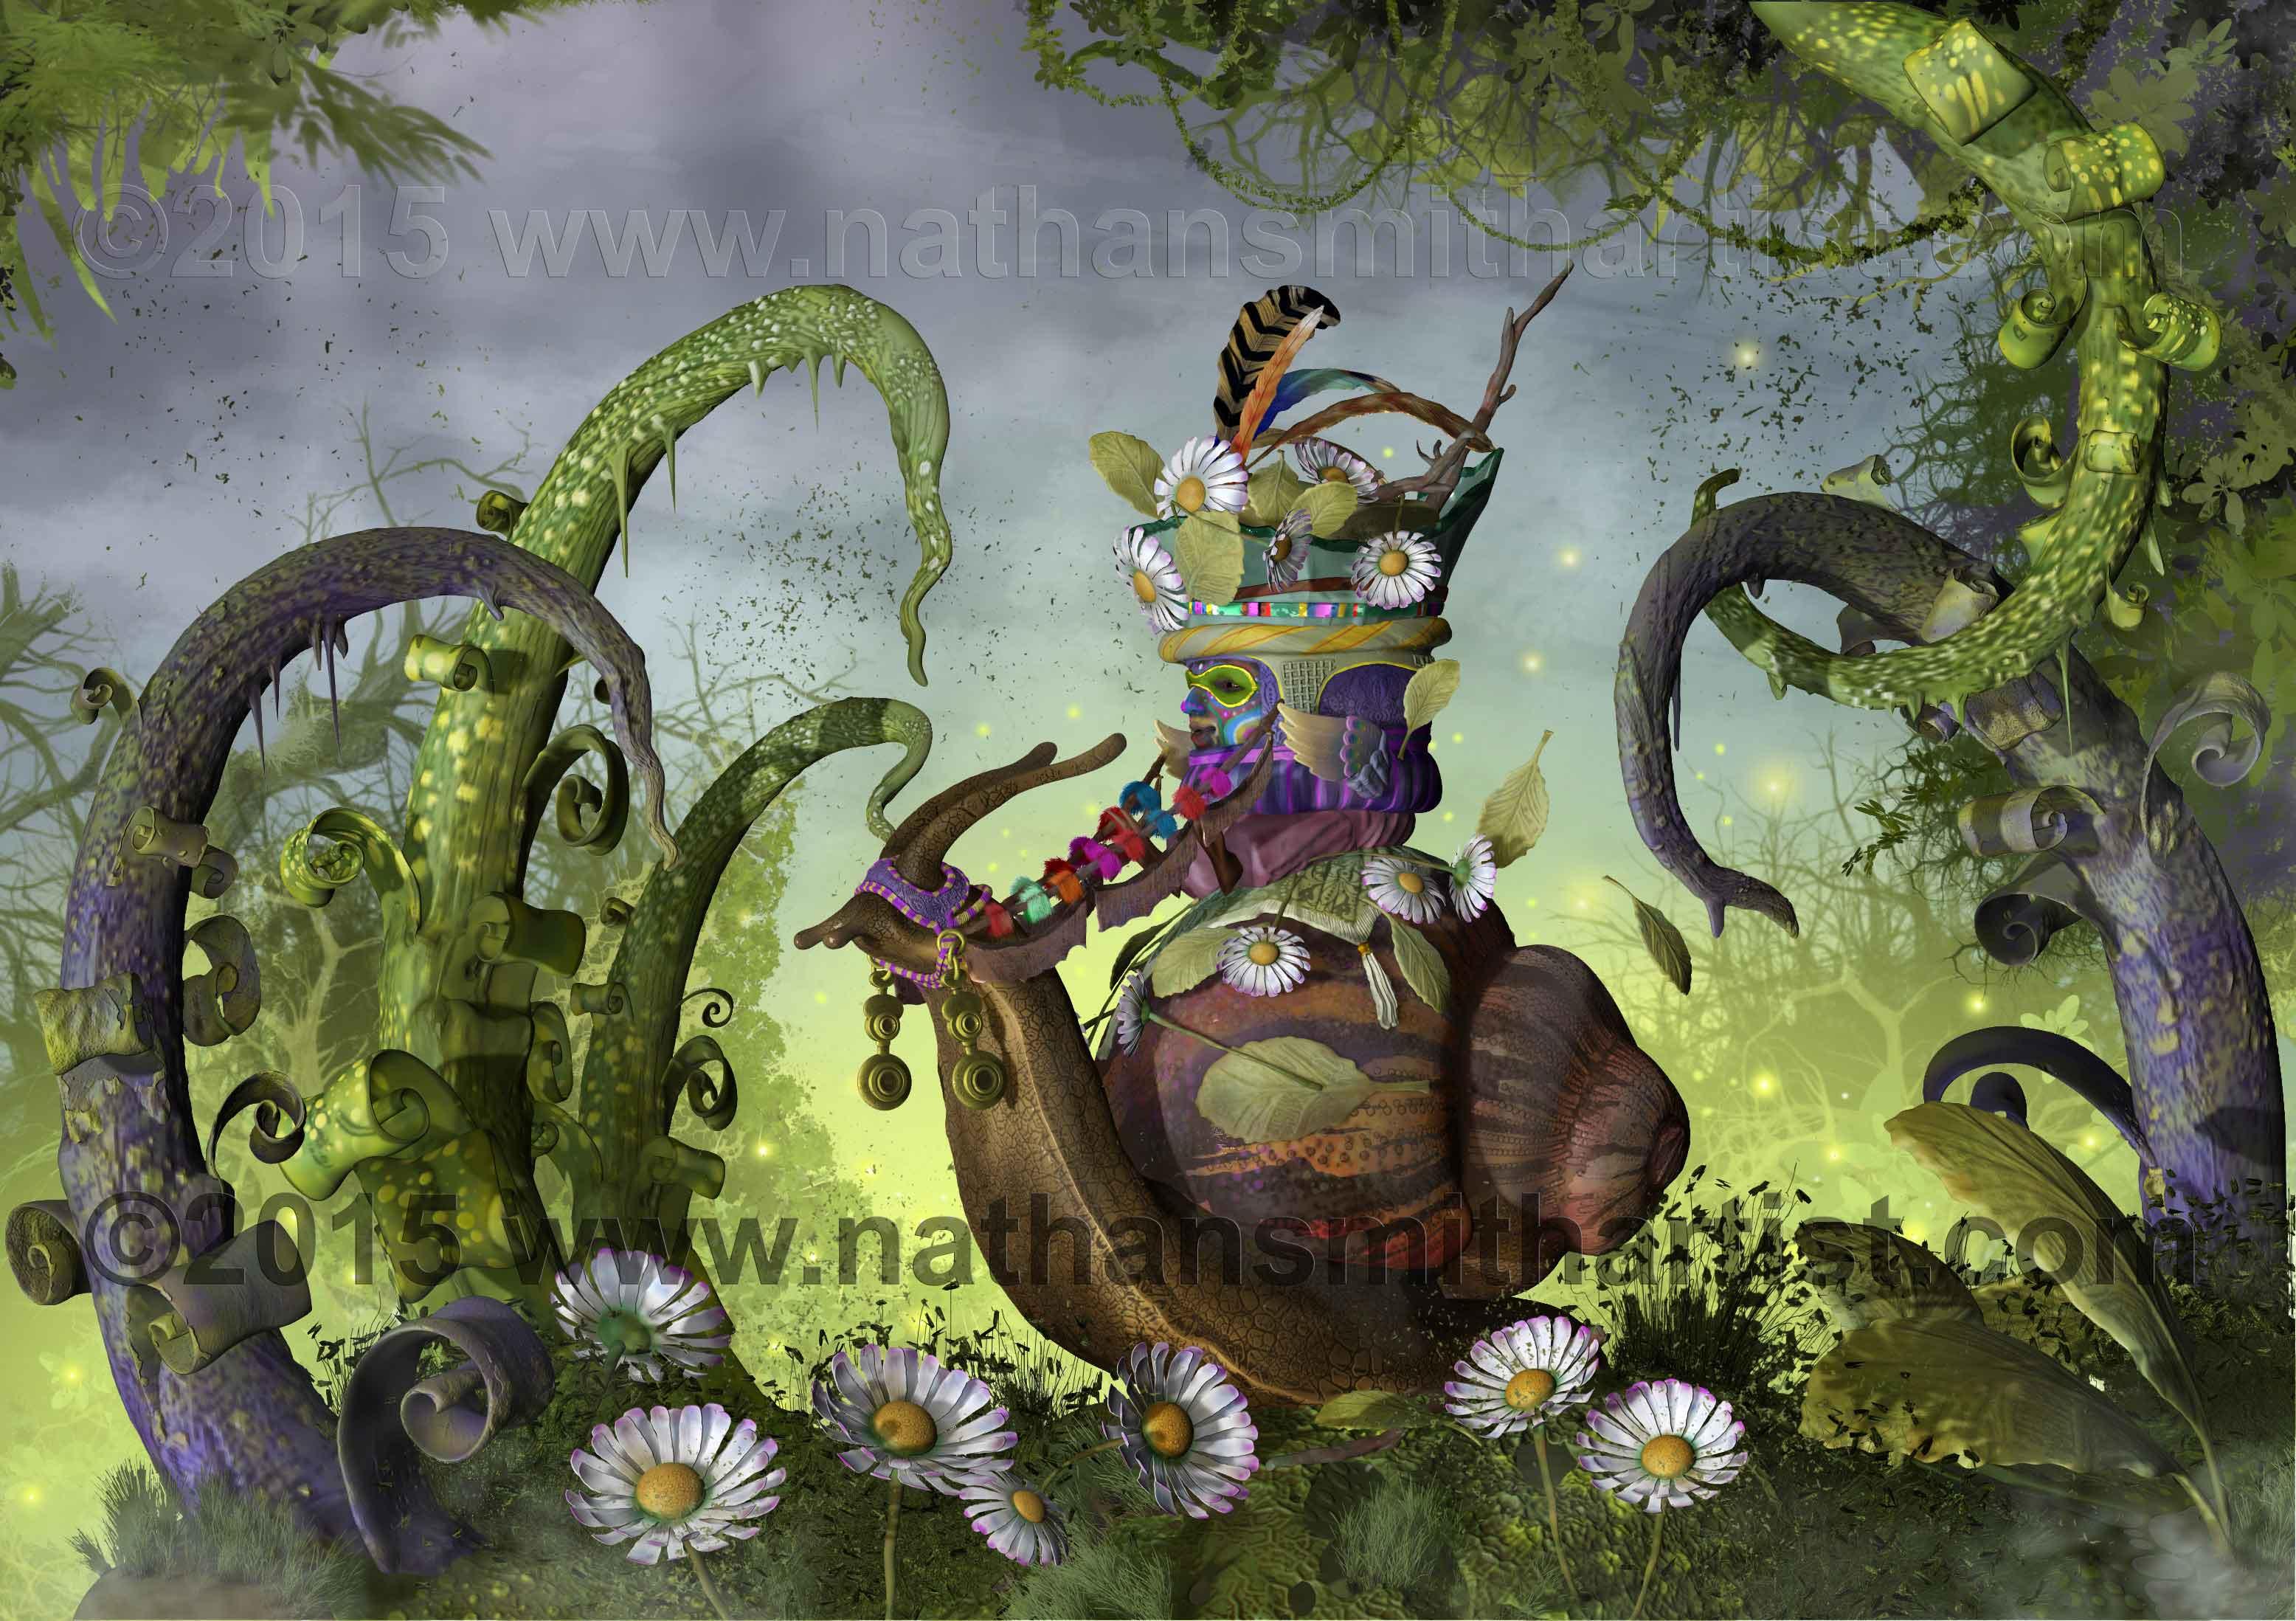 Snail,Daisies,Nathan Smith